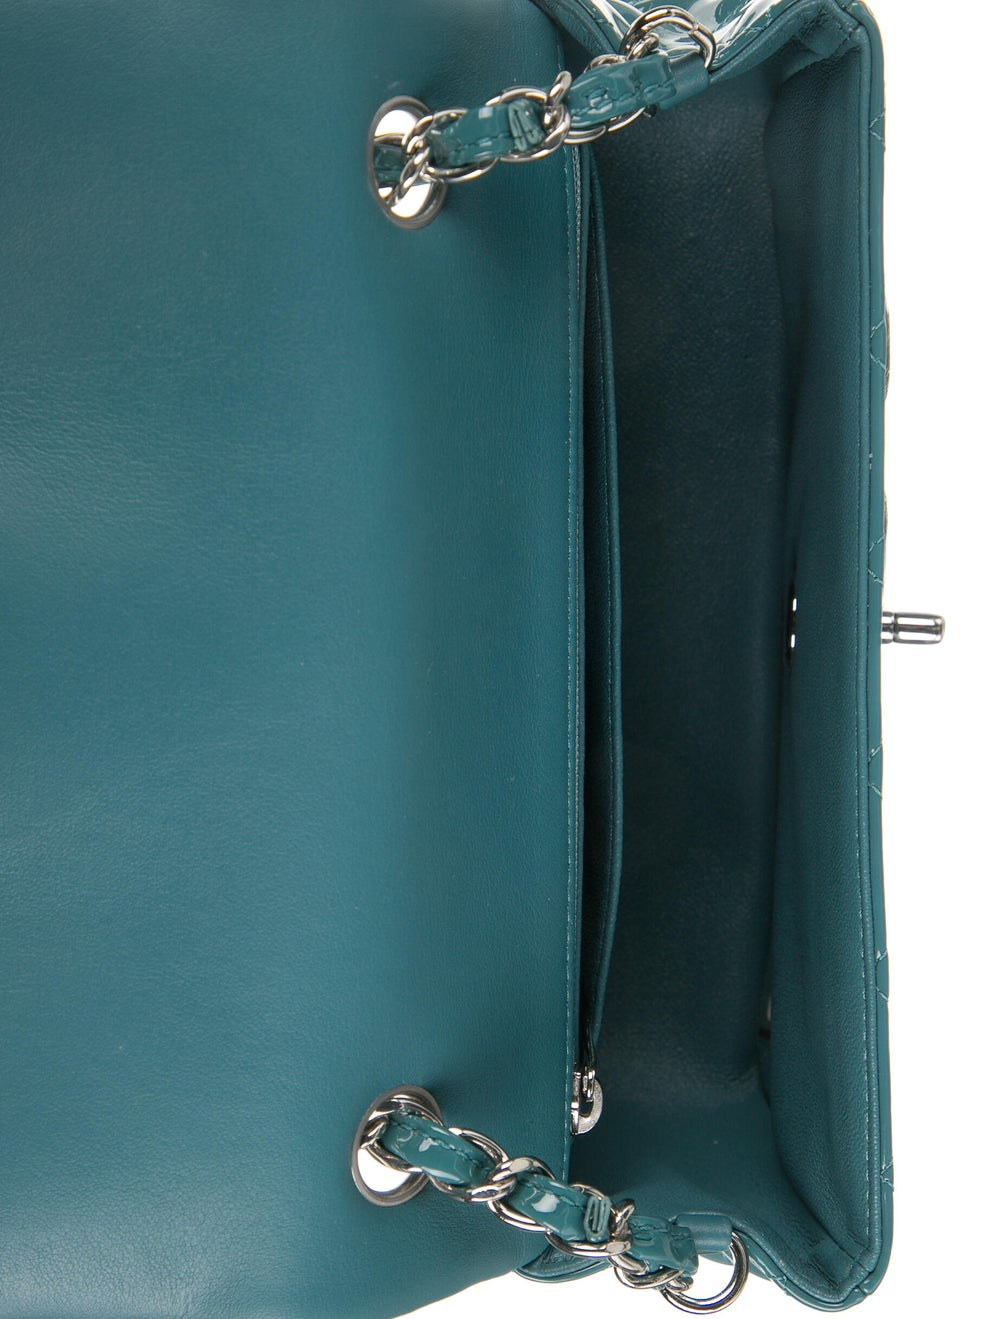 Chanel Classic Rectangular Mini Flap Bag Blue - image 5